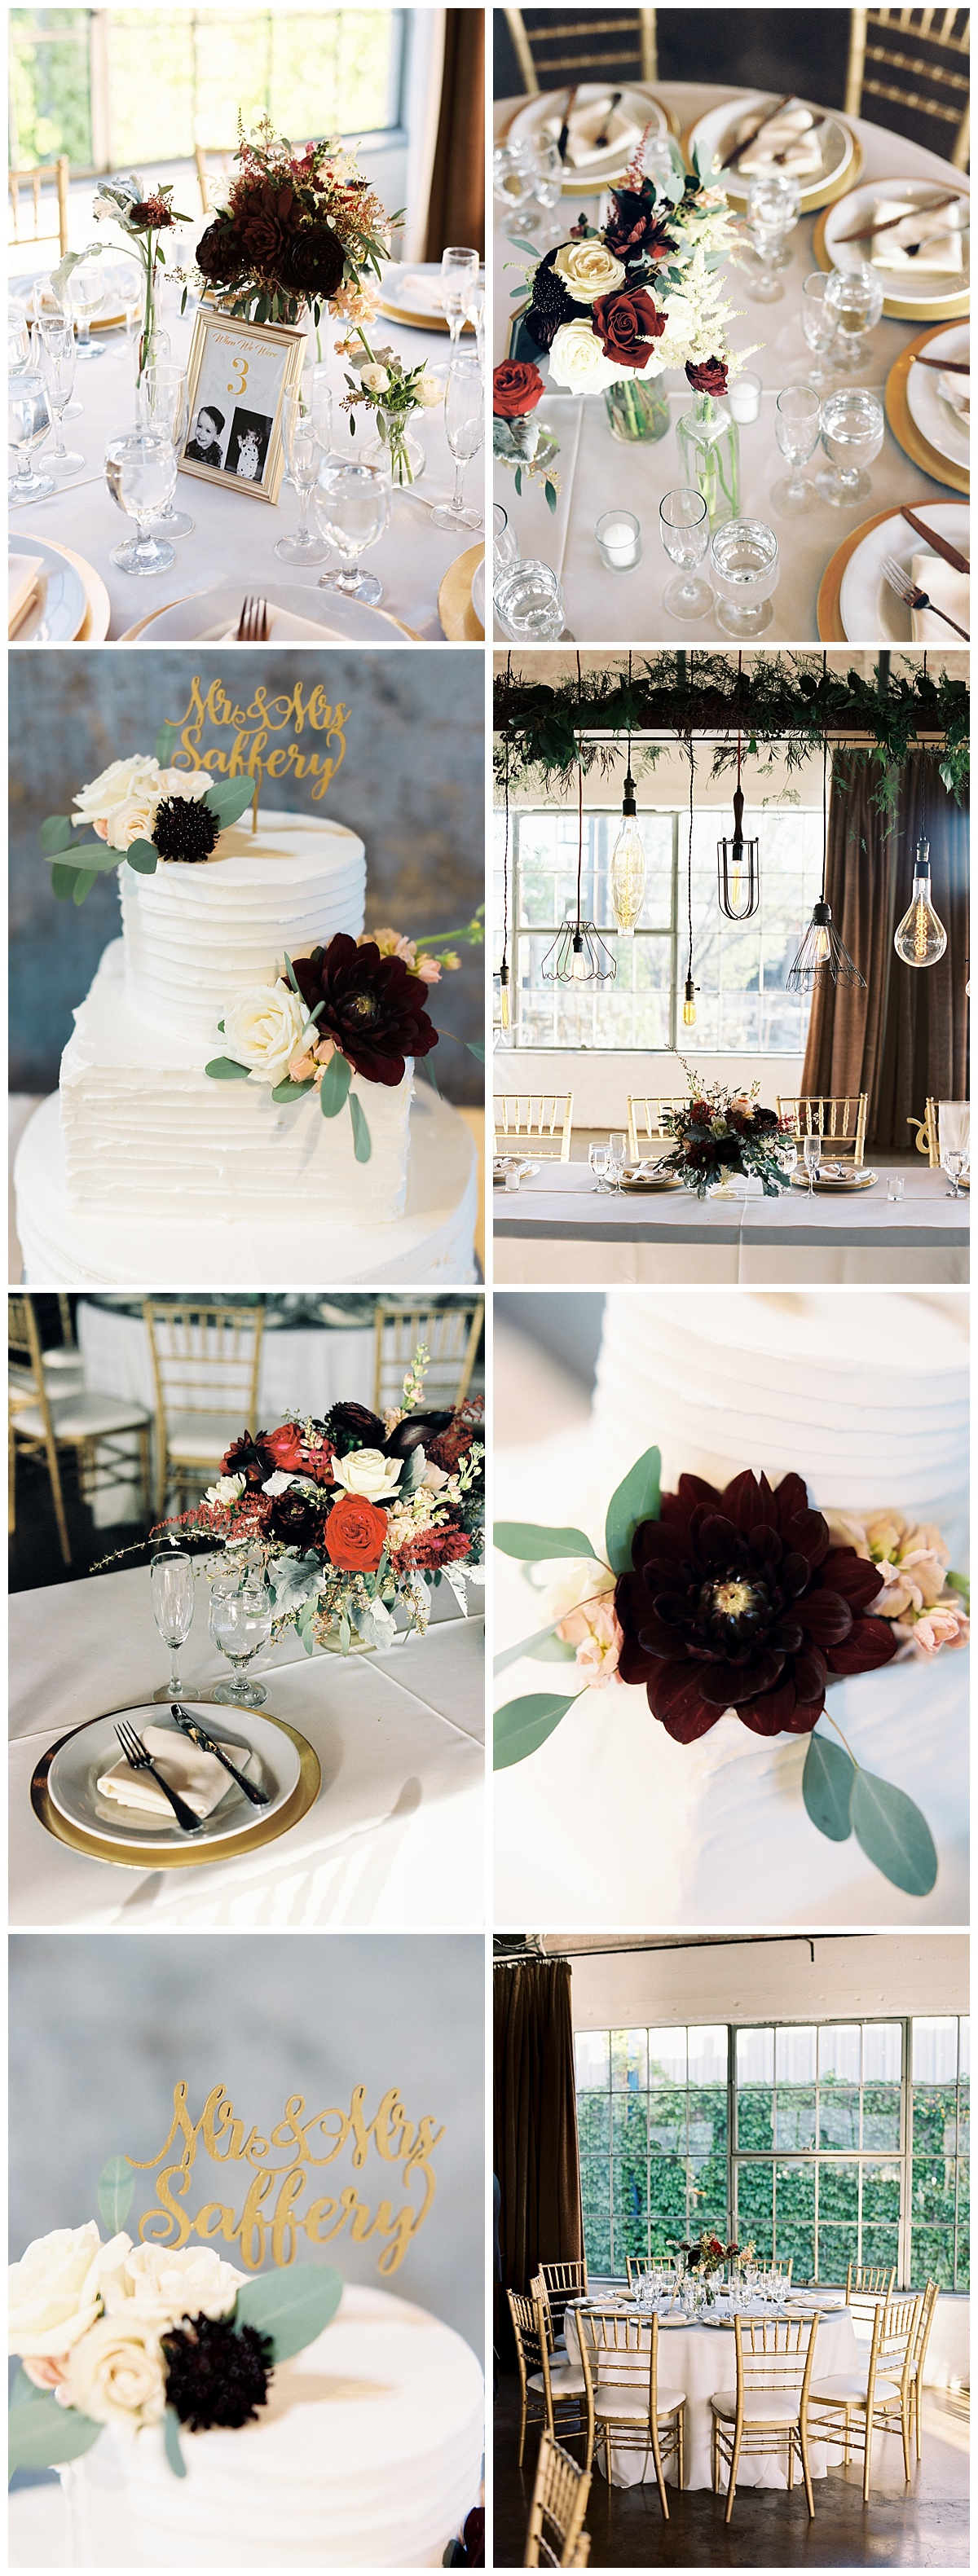 hickory-stree-annex-wedding-ar-photography-nicole-nolan-5.jpg